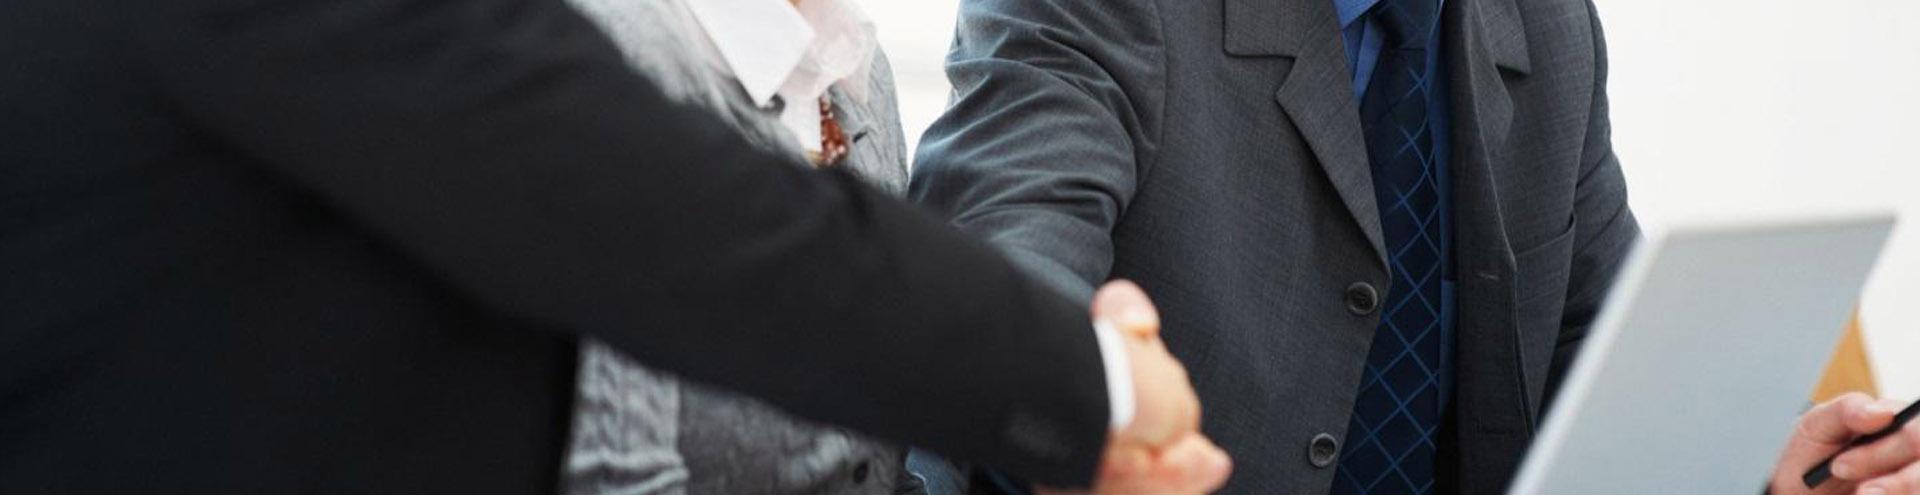 консультация юриста в Калуге